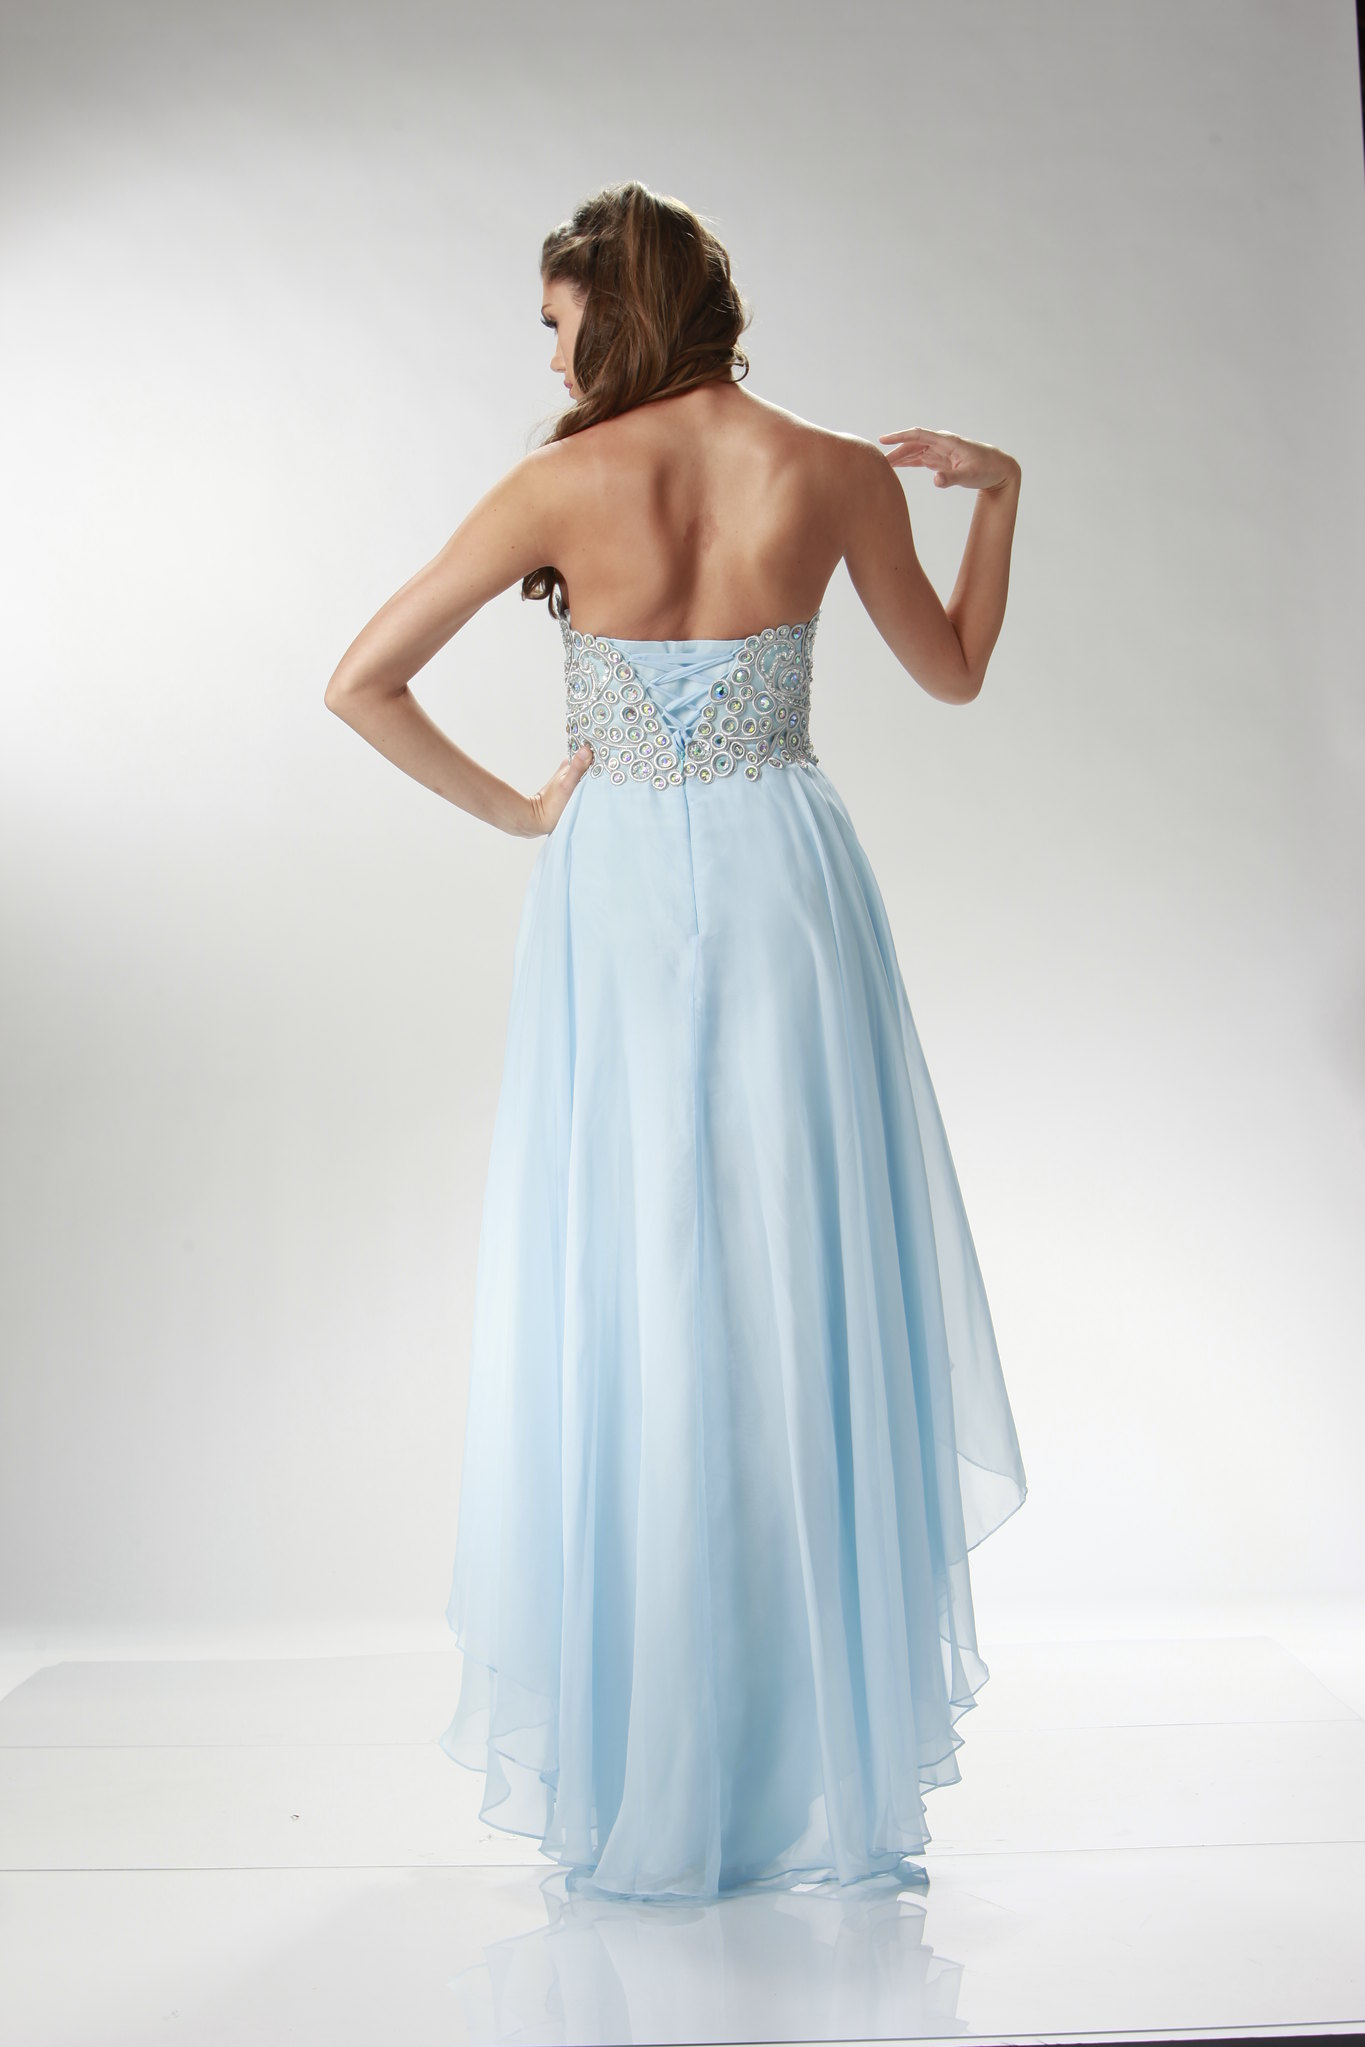 High Low Long Short Chiffon Prom Dress Sexy Plus Size Formal Corset Back Formal  eBay